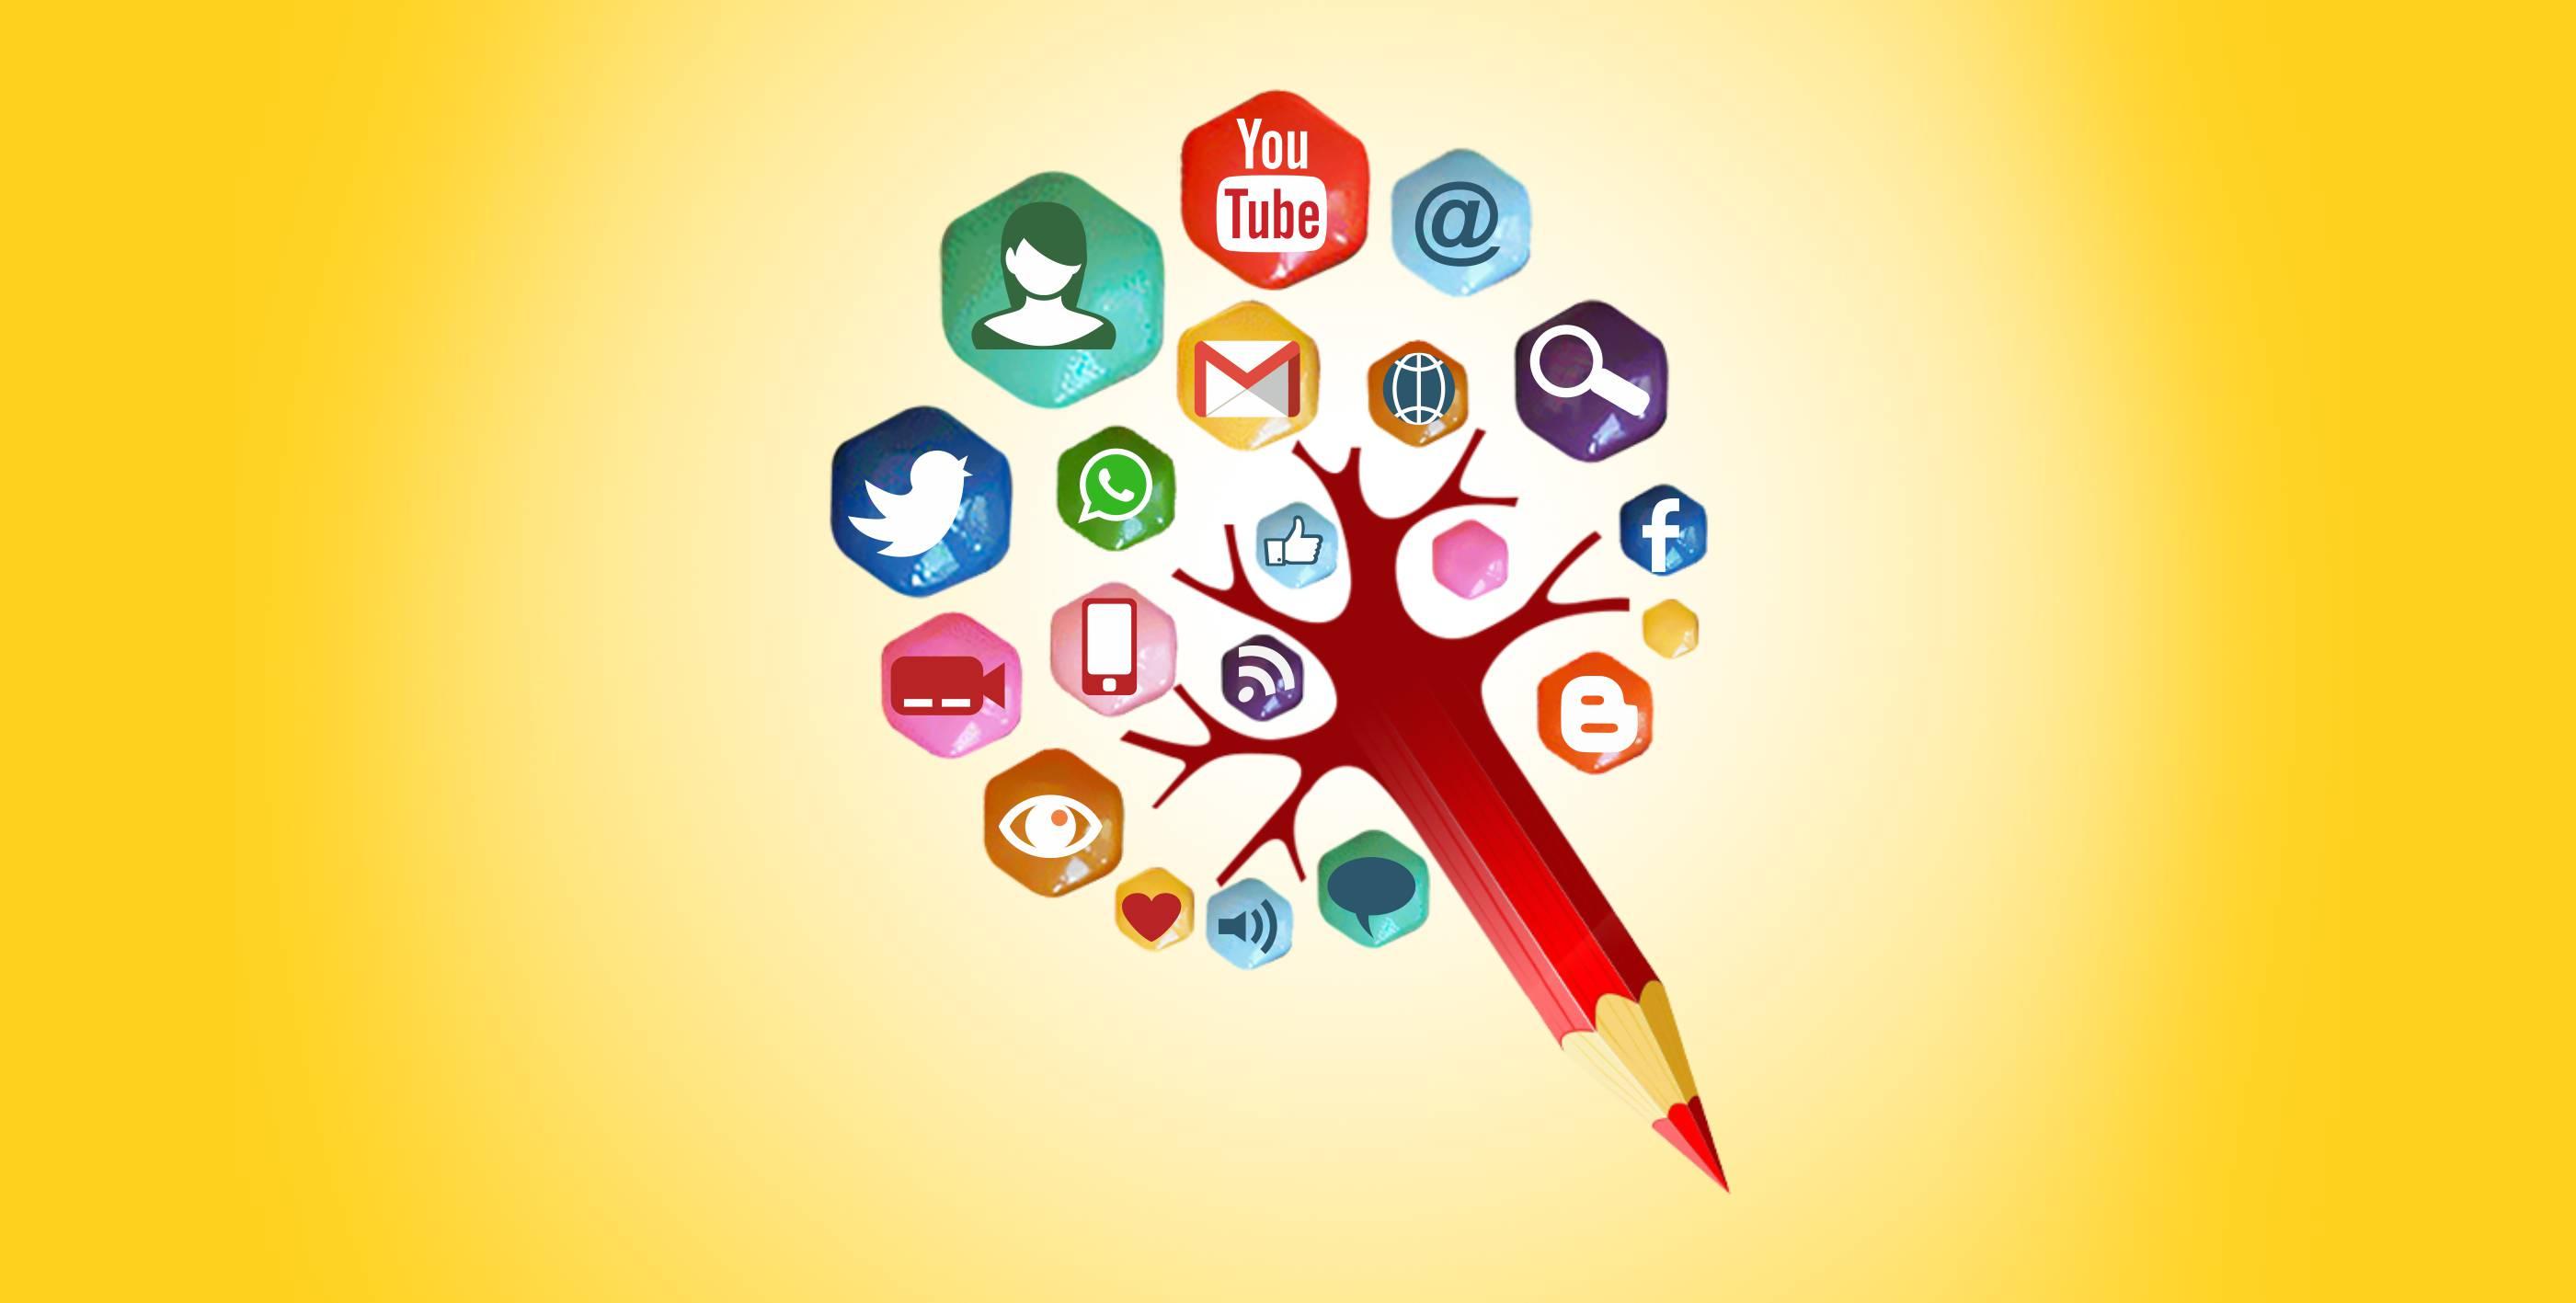 Strategizing your social media marketing has never been so easy! - Digital  Hangover